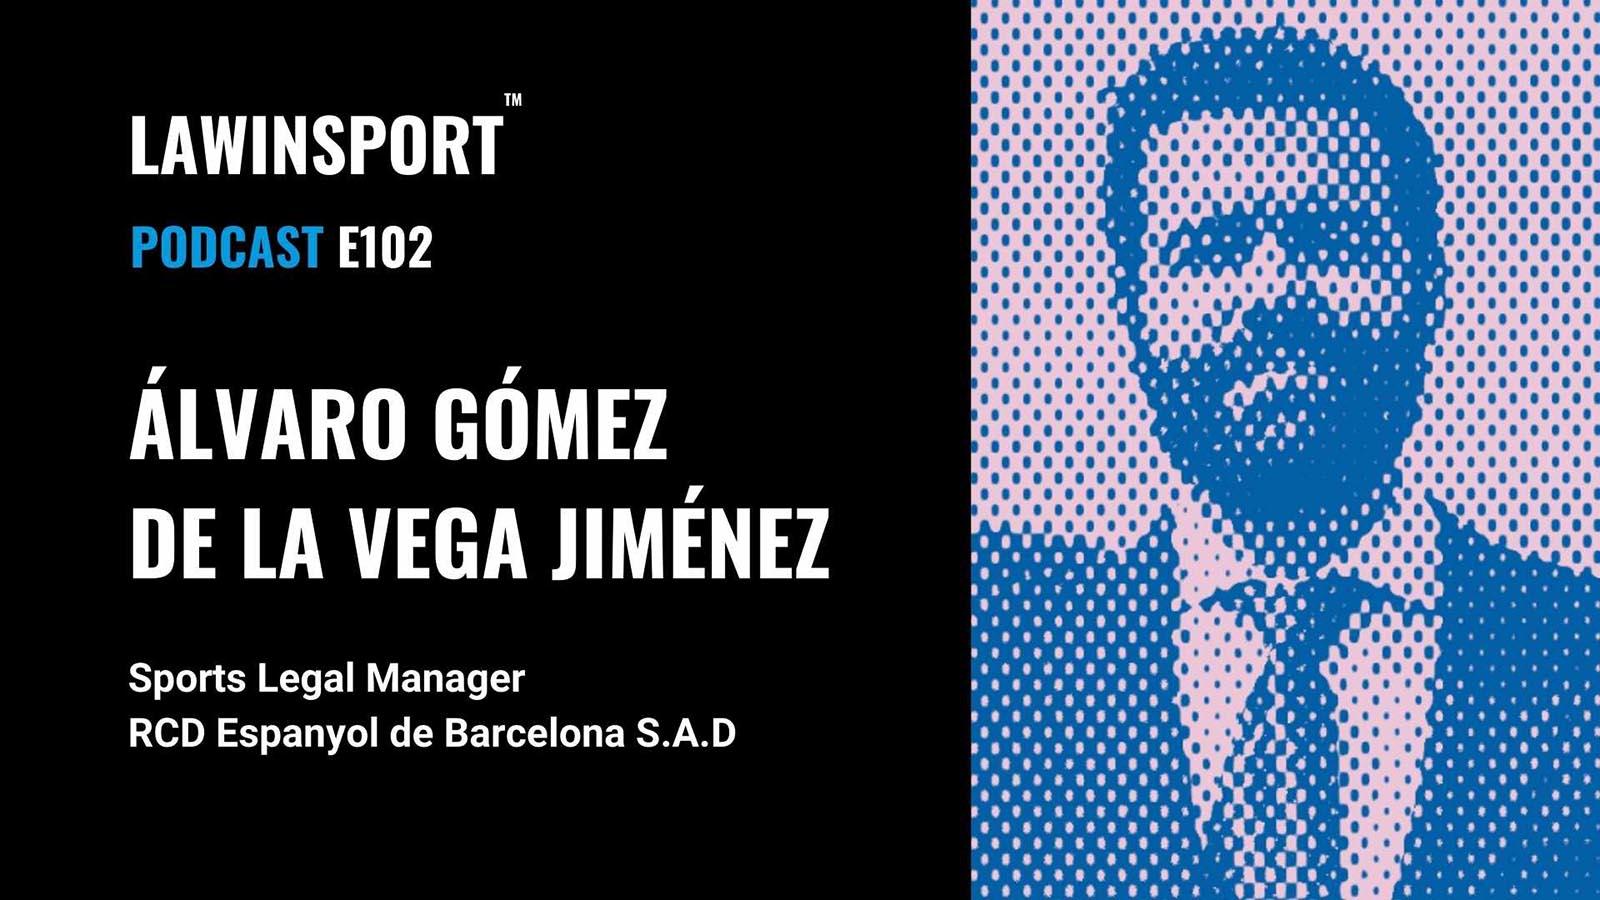 Álvaro Gómez de la Vega Jiménez, Sports Legal Manager at RCD Espanyol de Barcelona S.A.D - E102